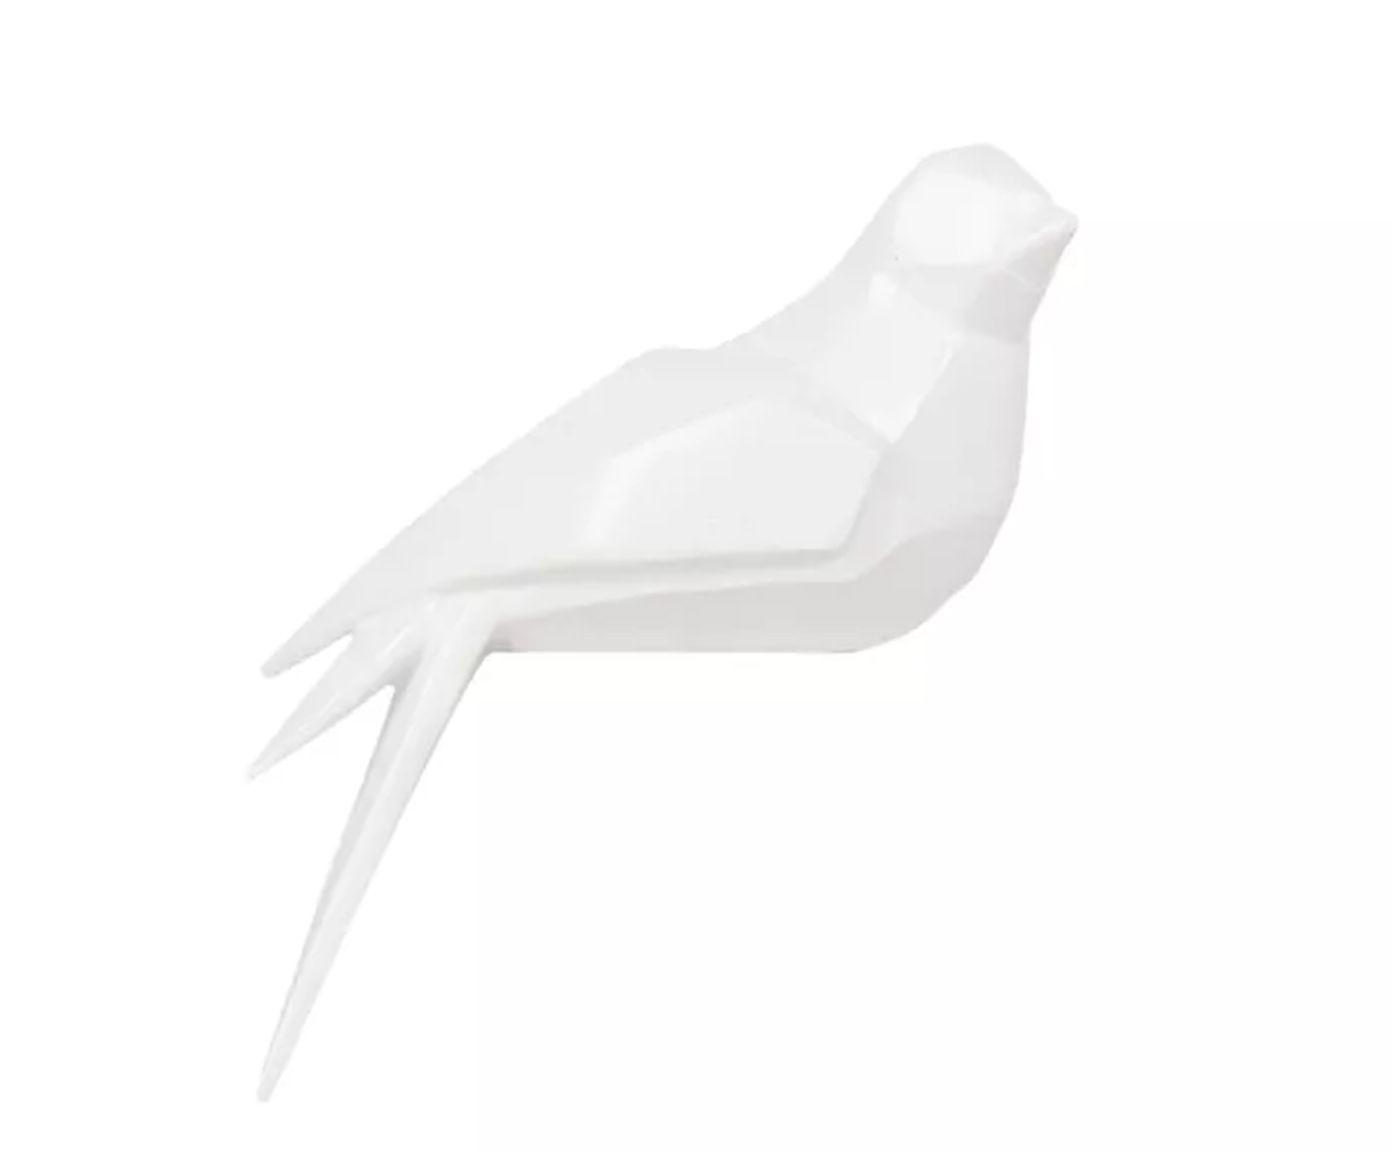 Adorno Oiseau Pássaro I Branco - 24X8X8cm | Westwing.com.br